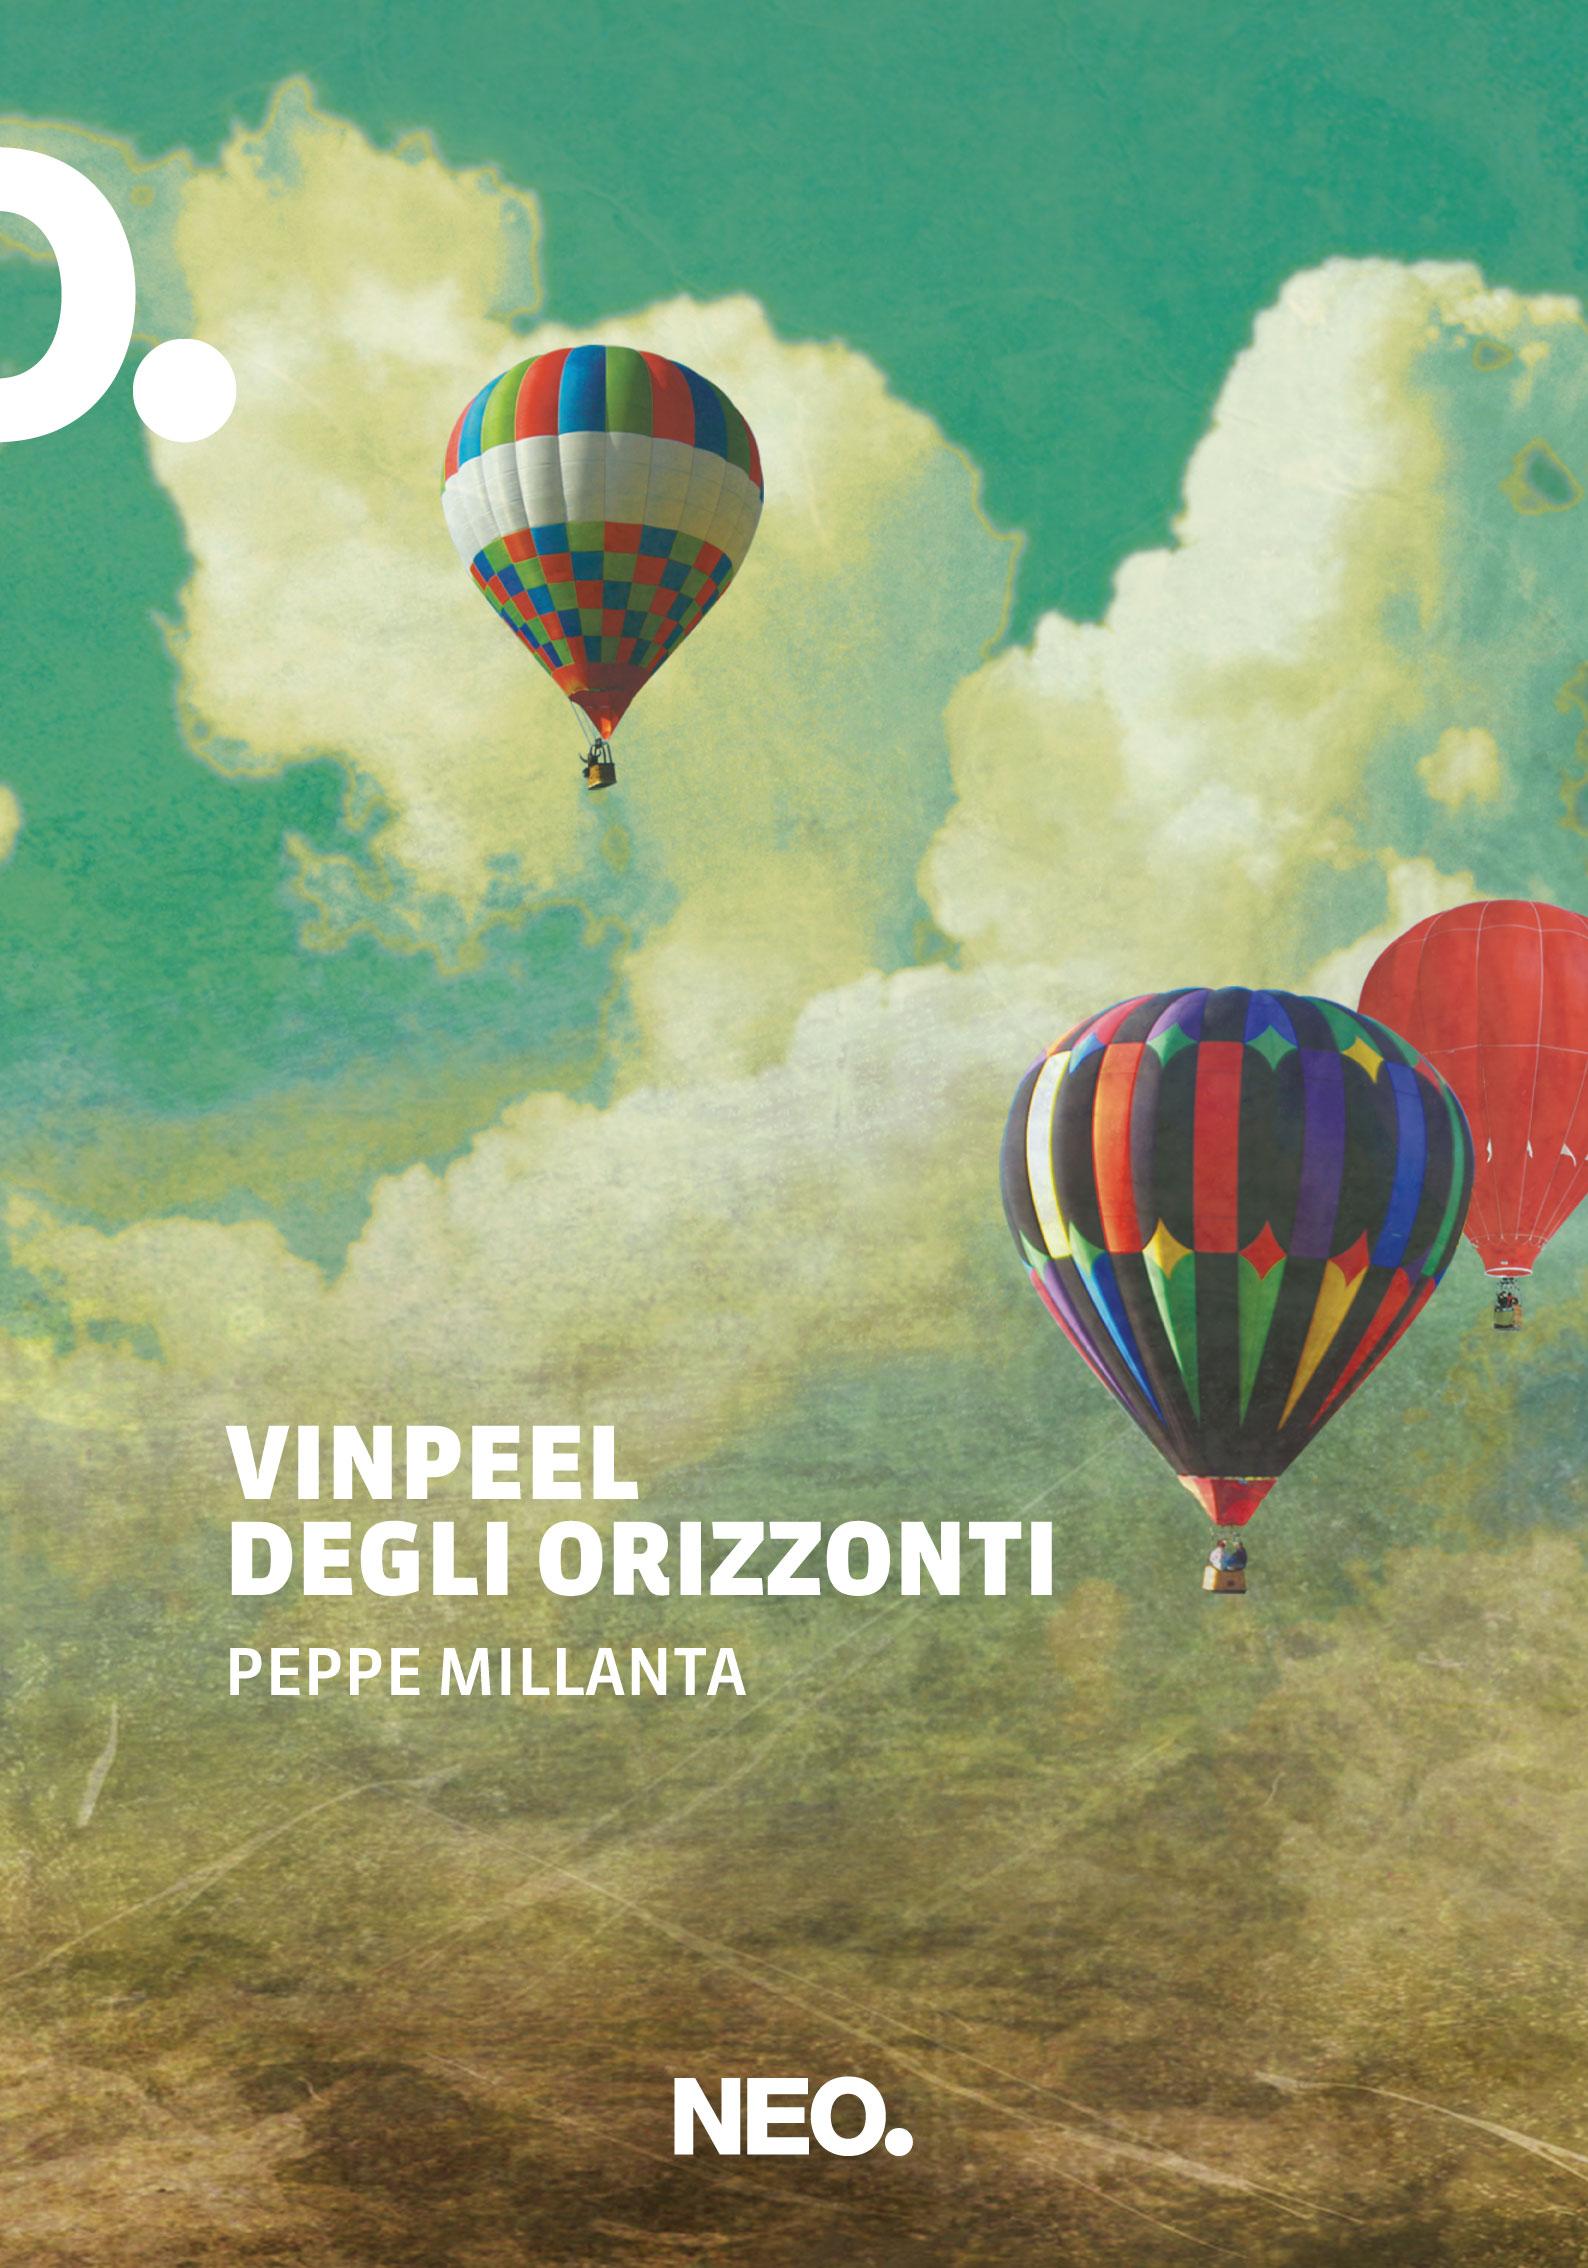 (38) Vinpeel degli orizzonti